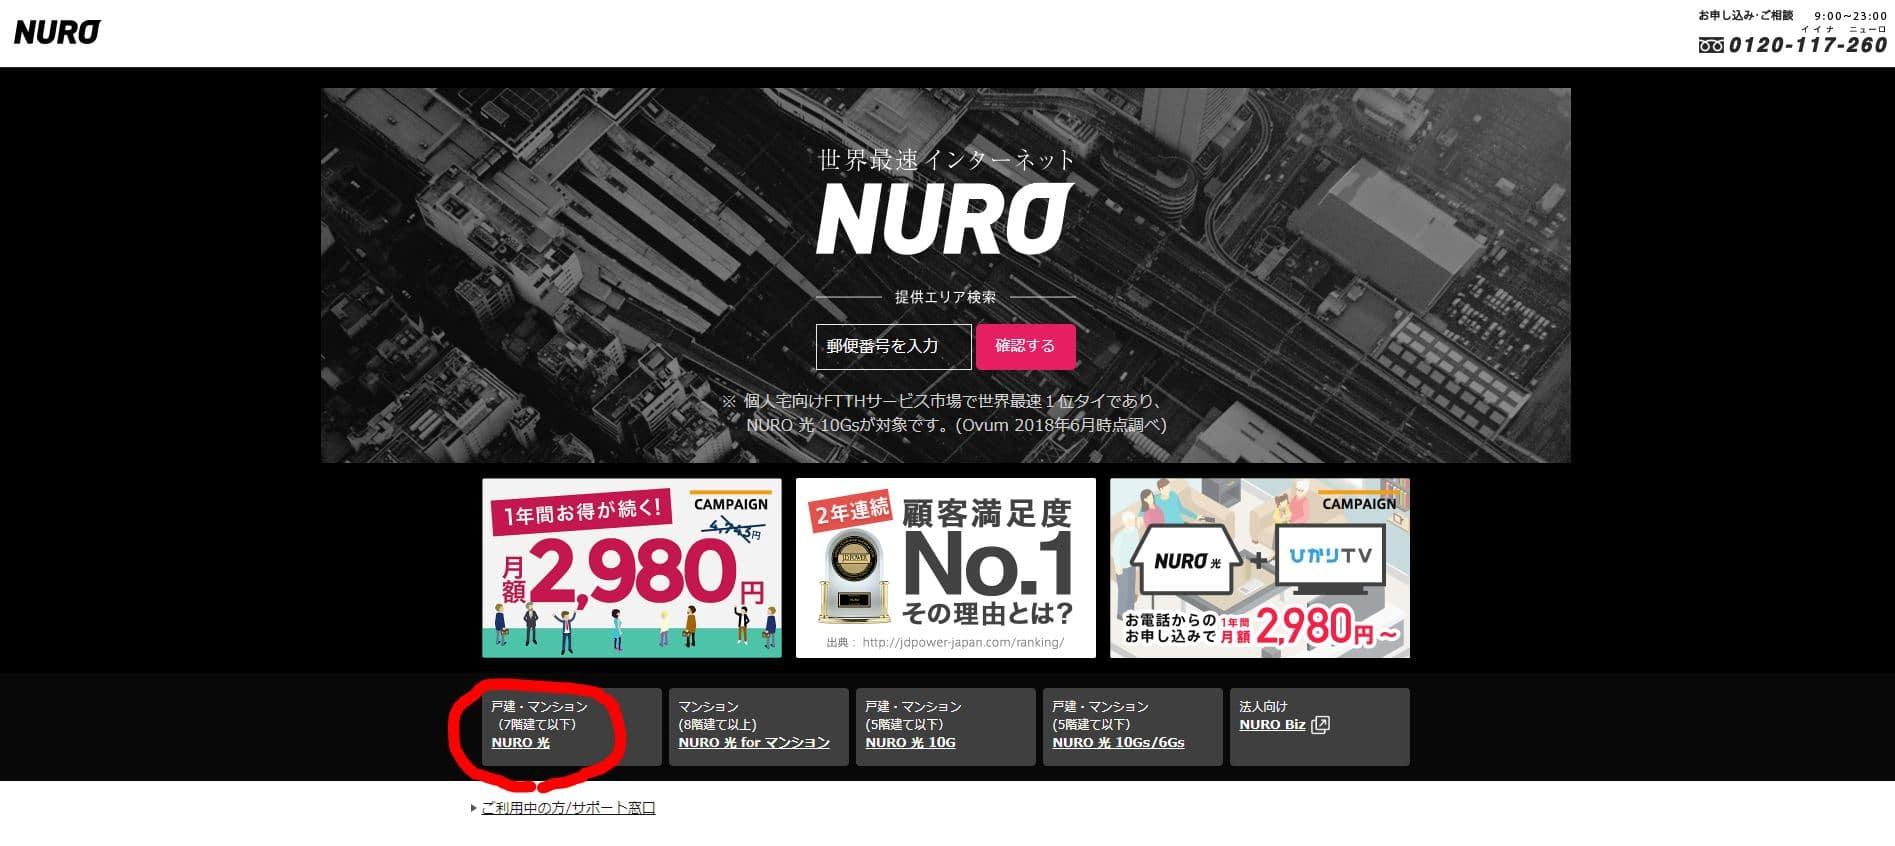 NURO光公式サイト 速度測定01